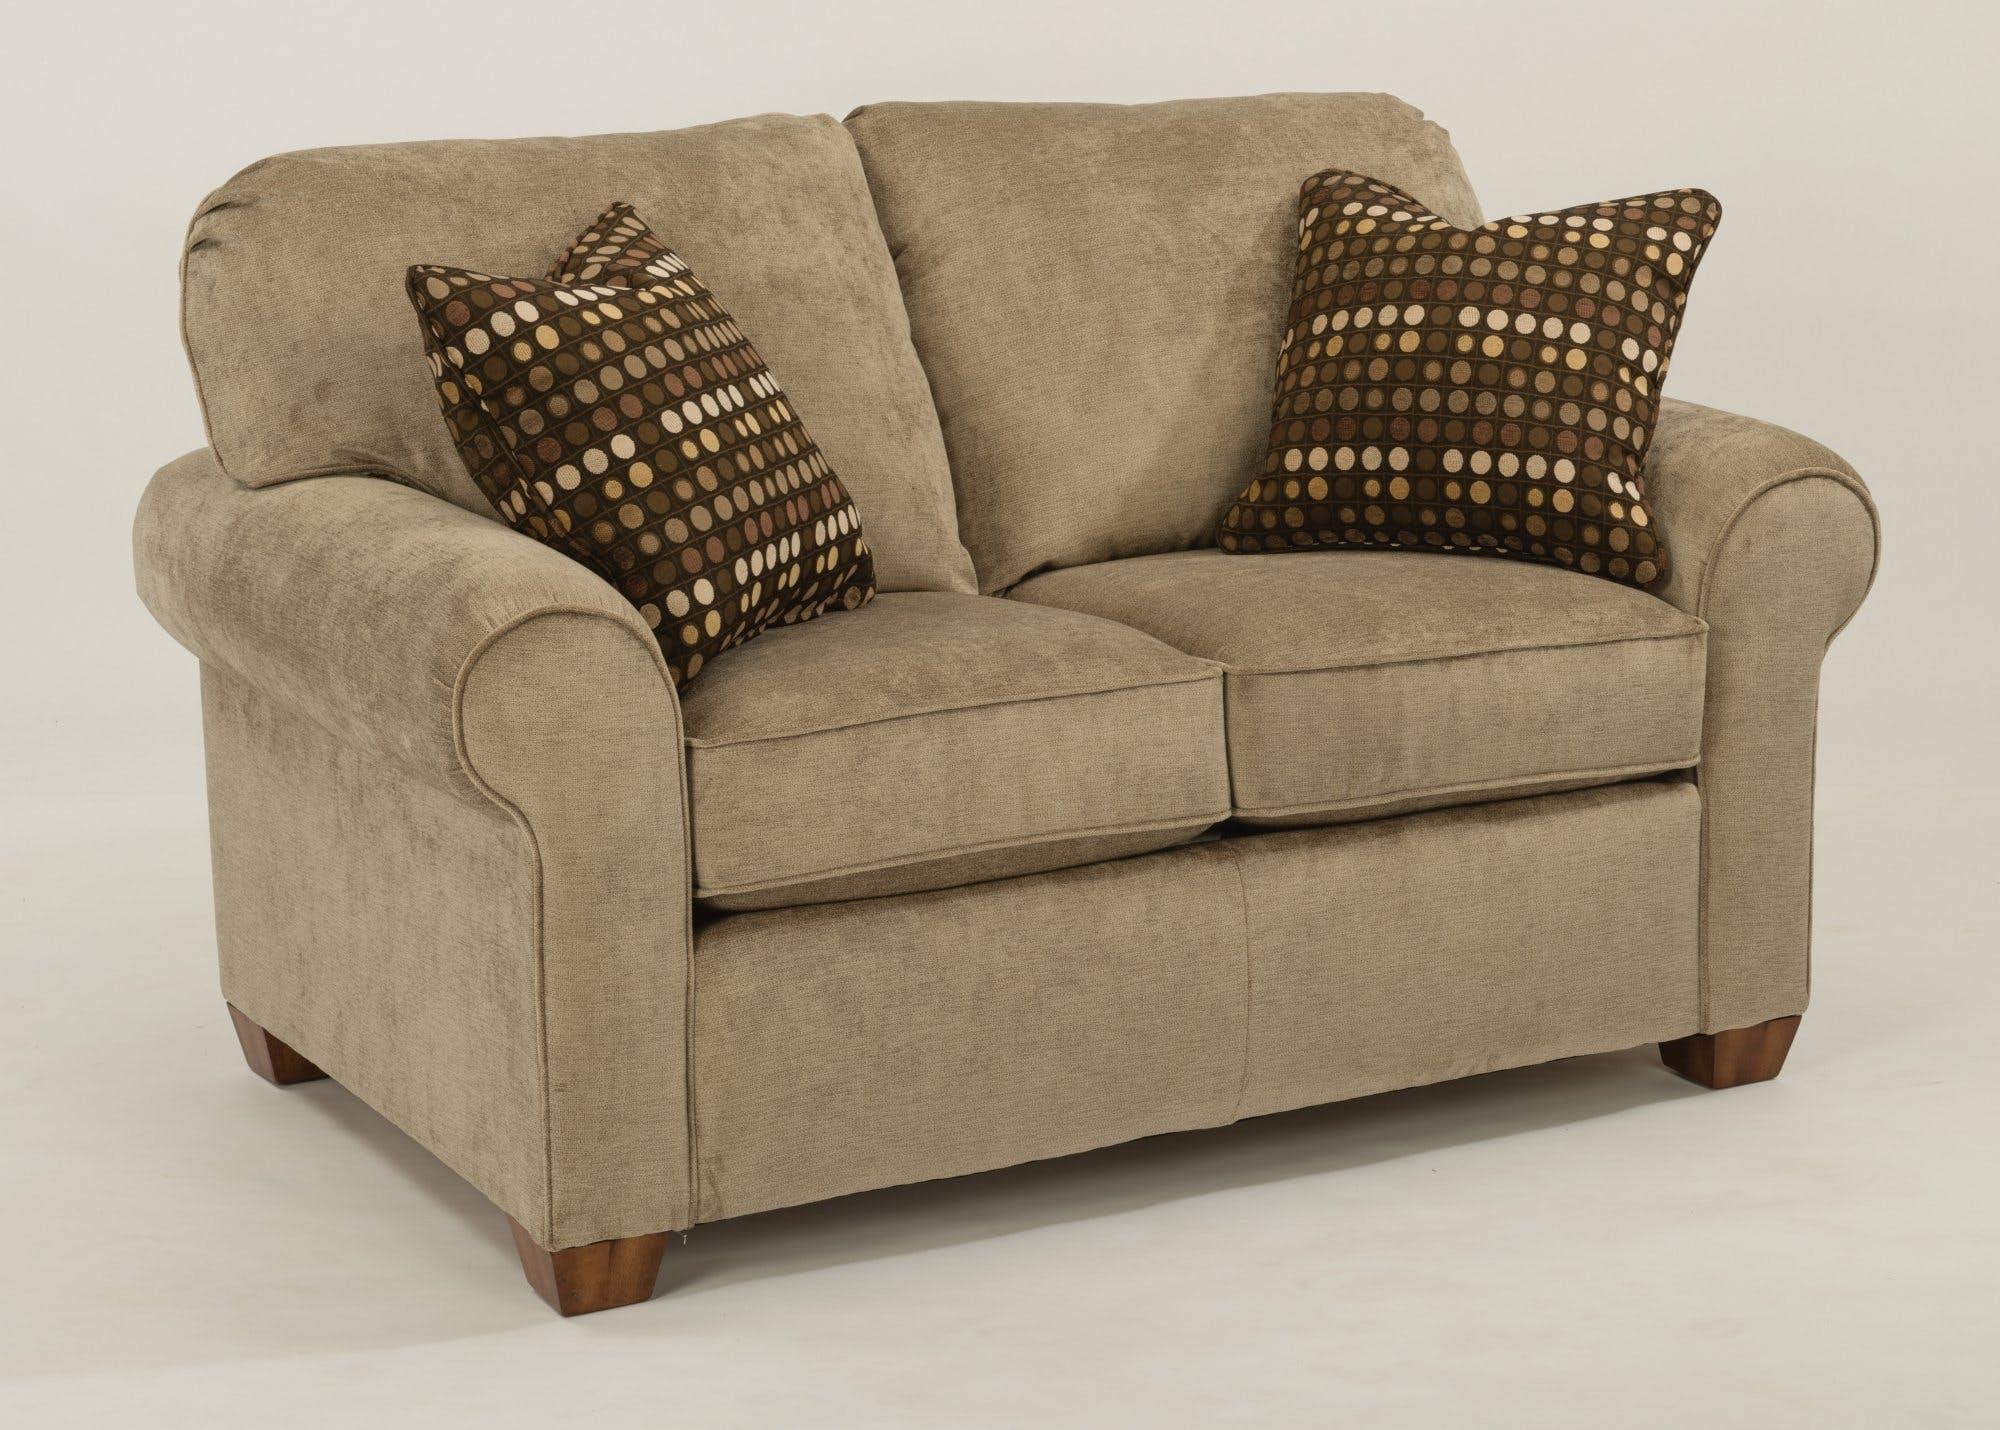 Flexsteel Living Room Fabric Loveseat 5535-20 - Patrick Furniture